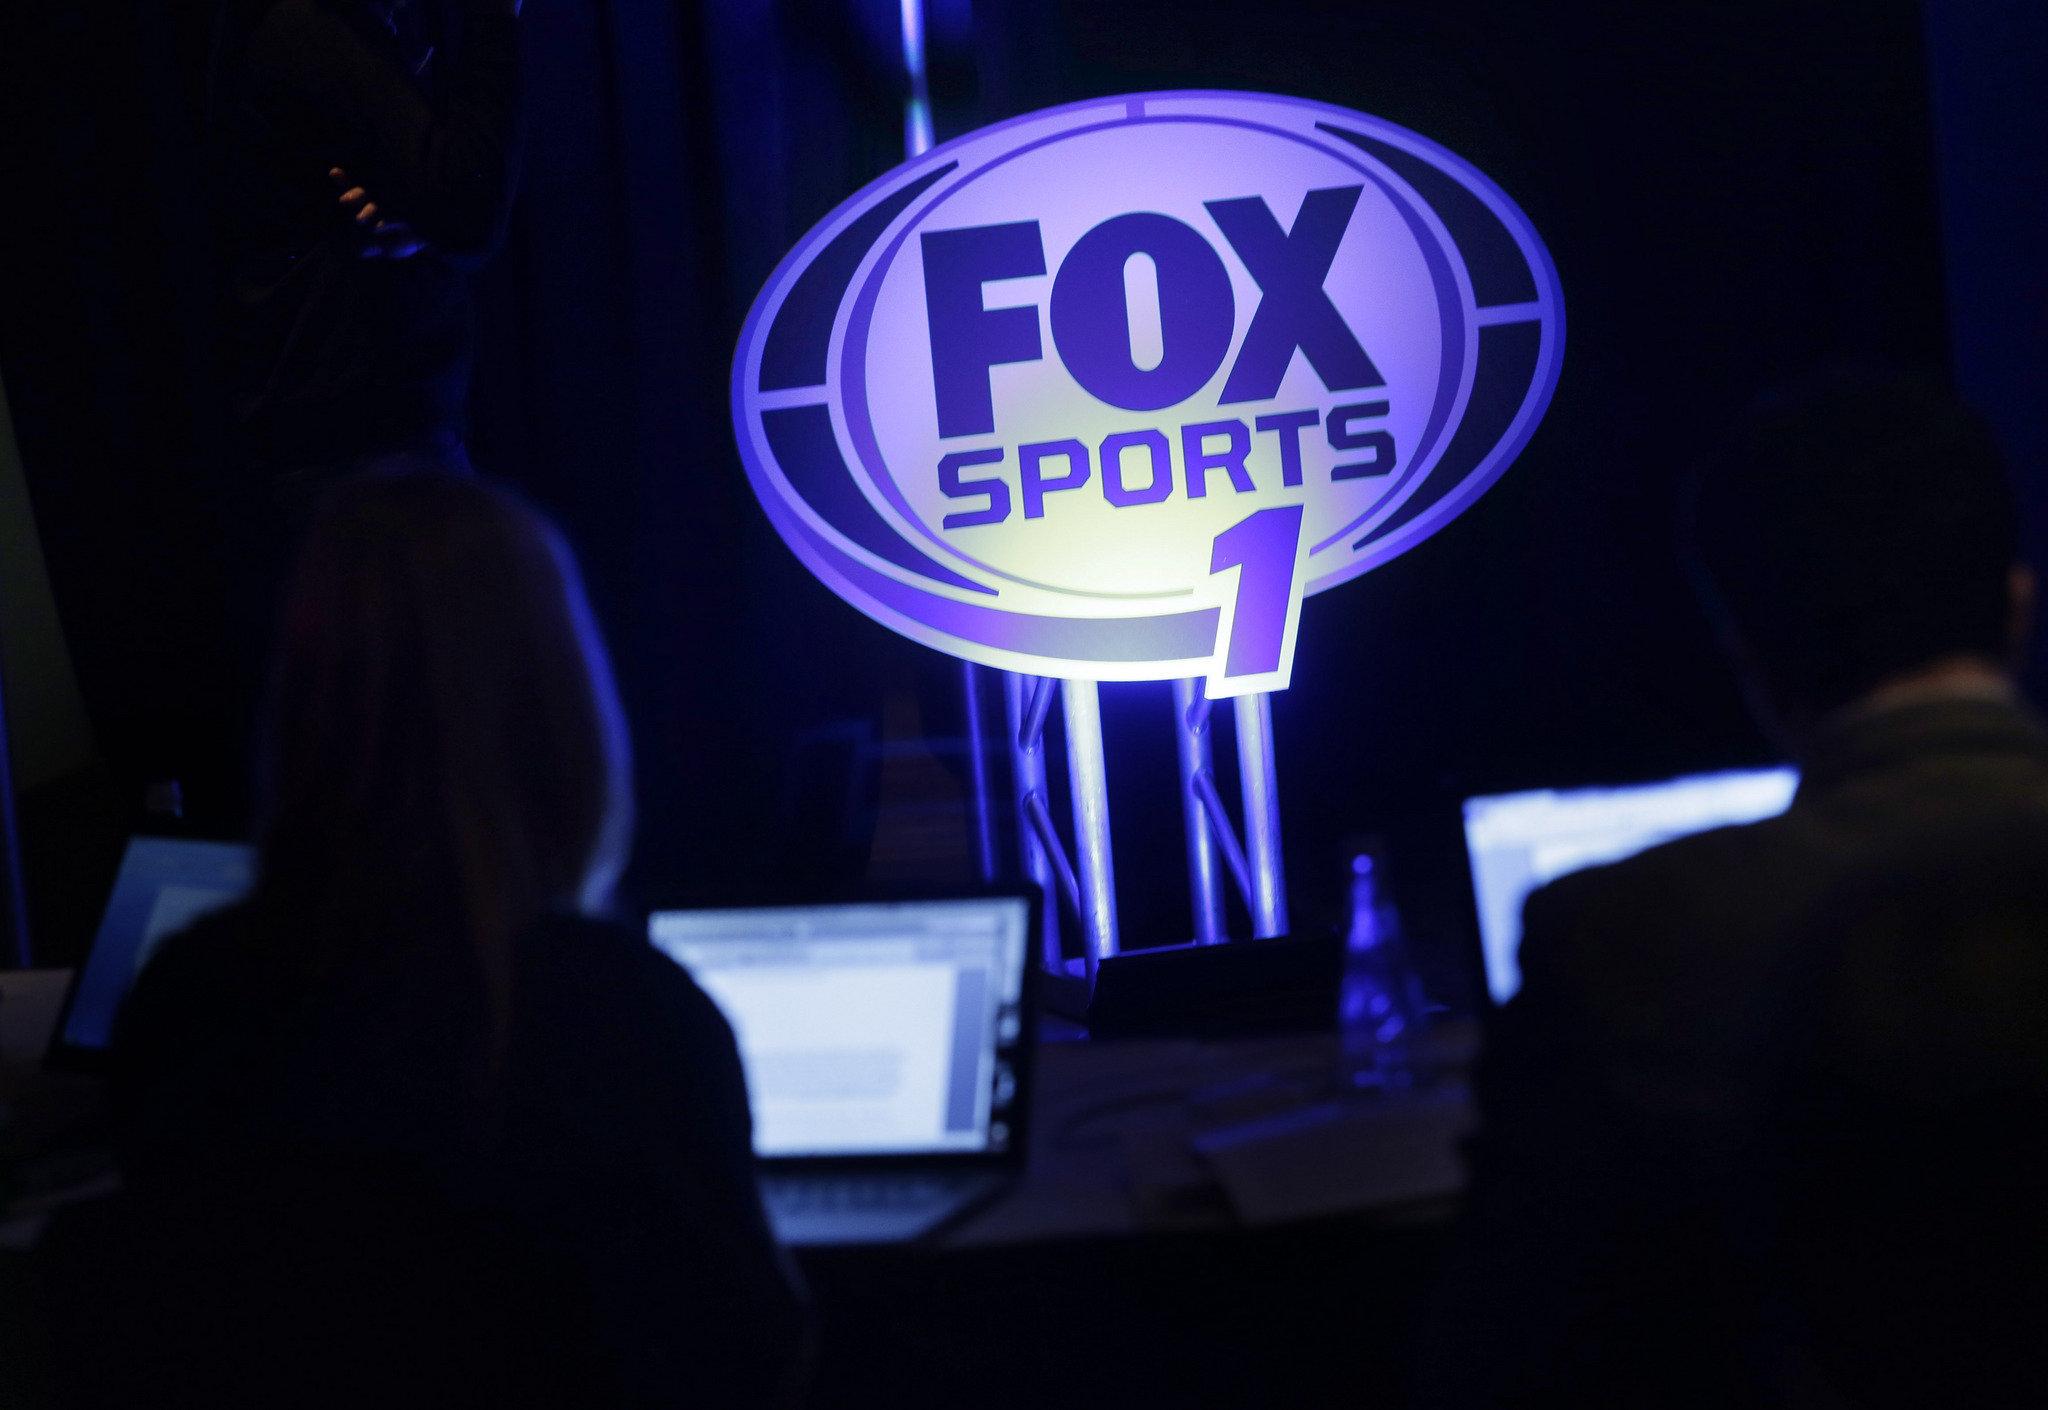 R Fox Sports FOX Sports Join...